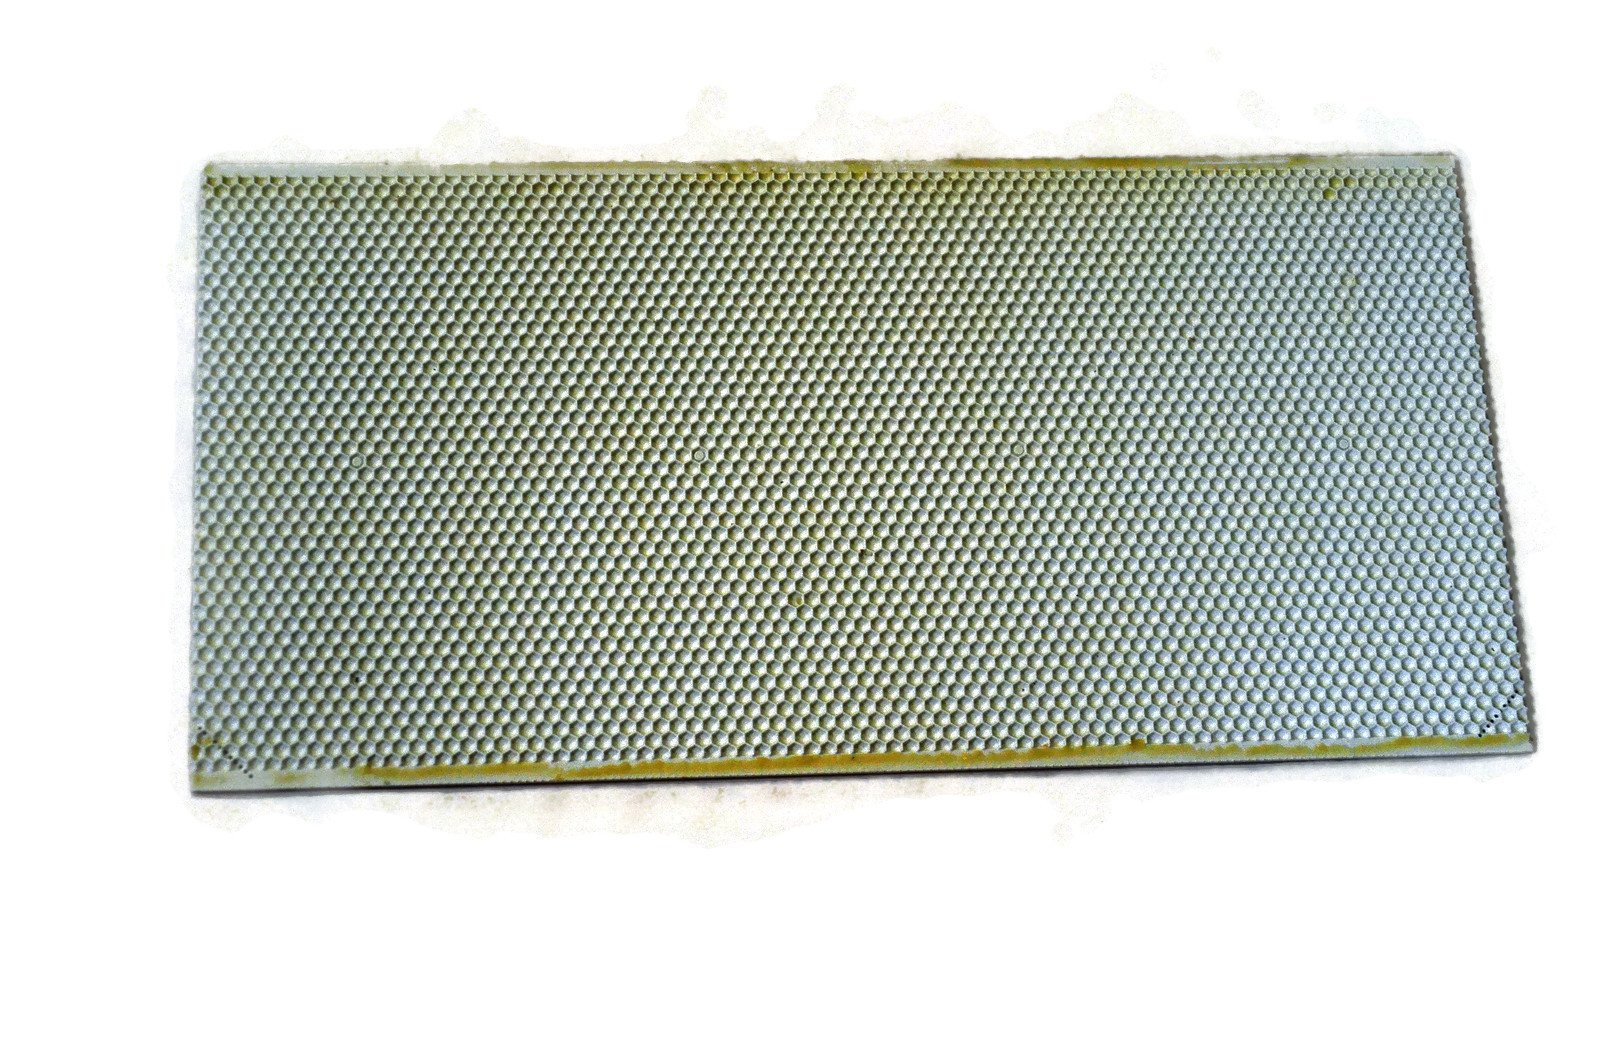 Acorn bee white plastic bee's wax coated deep foundation